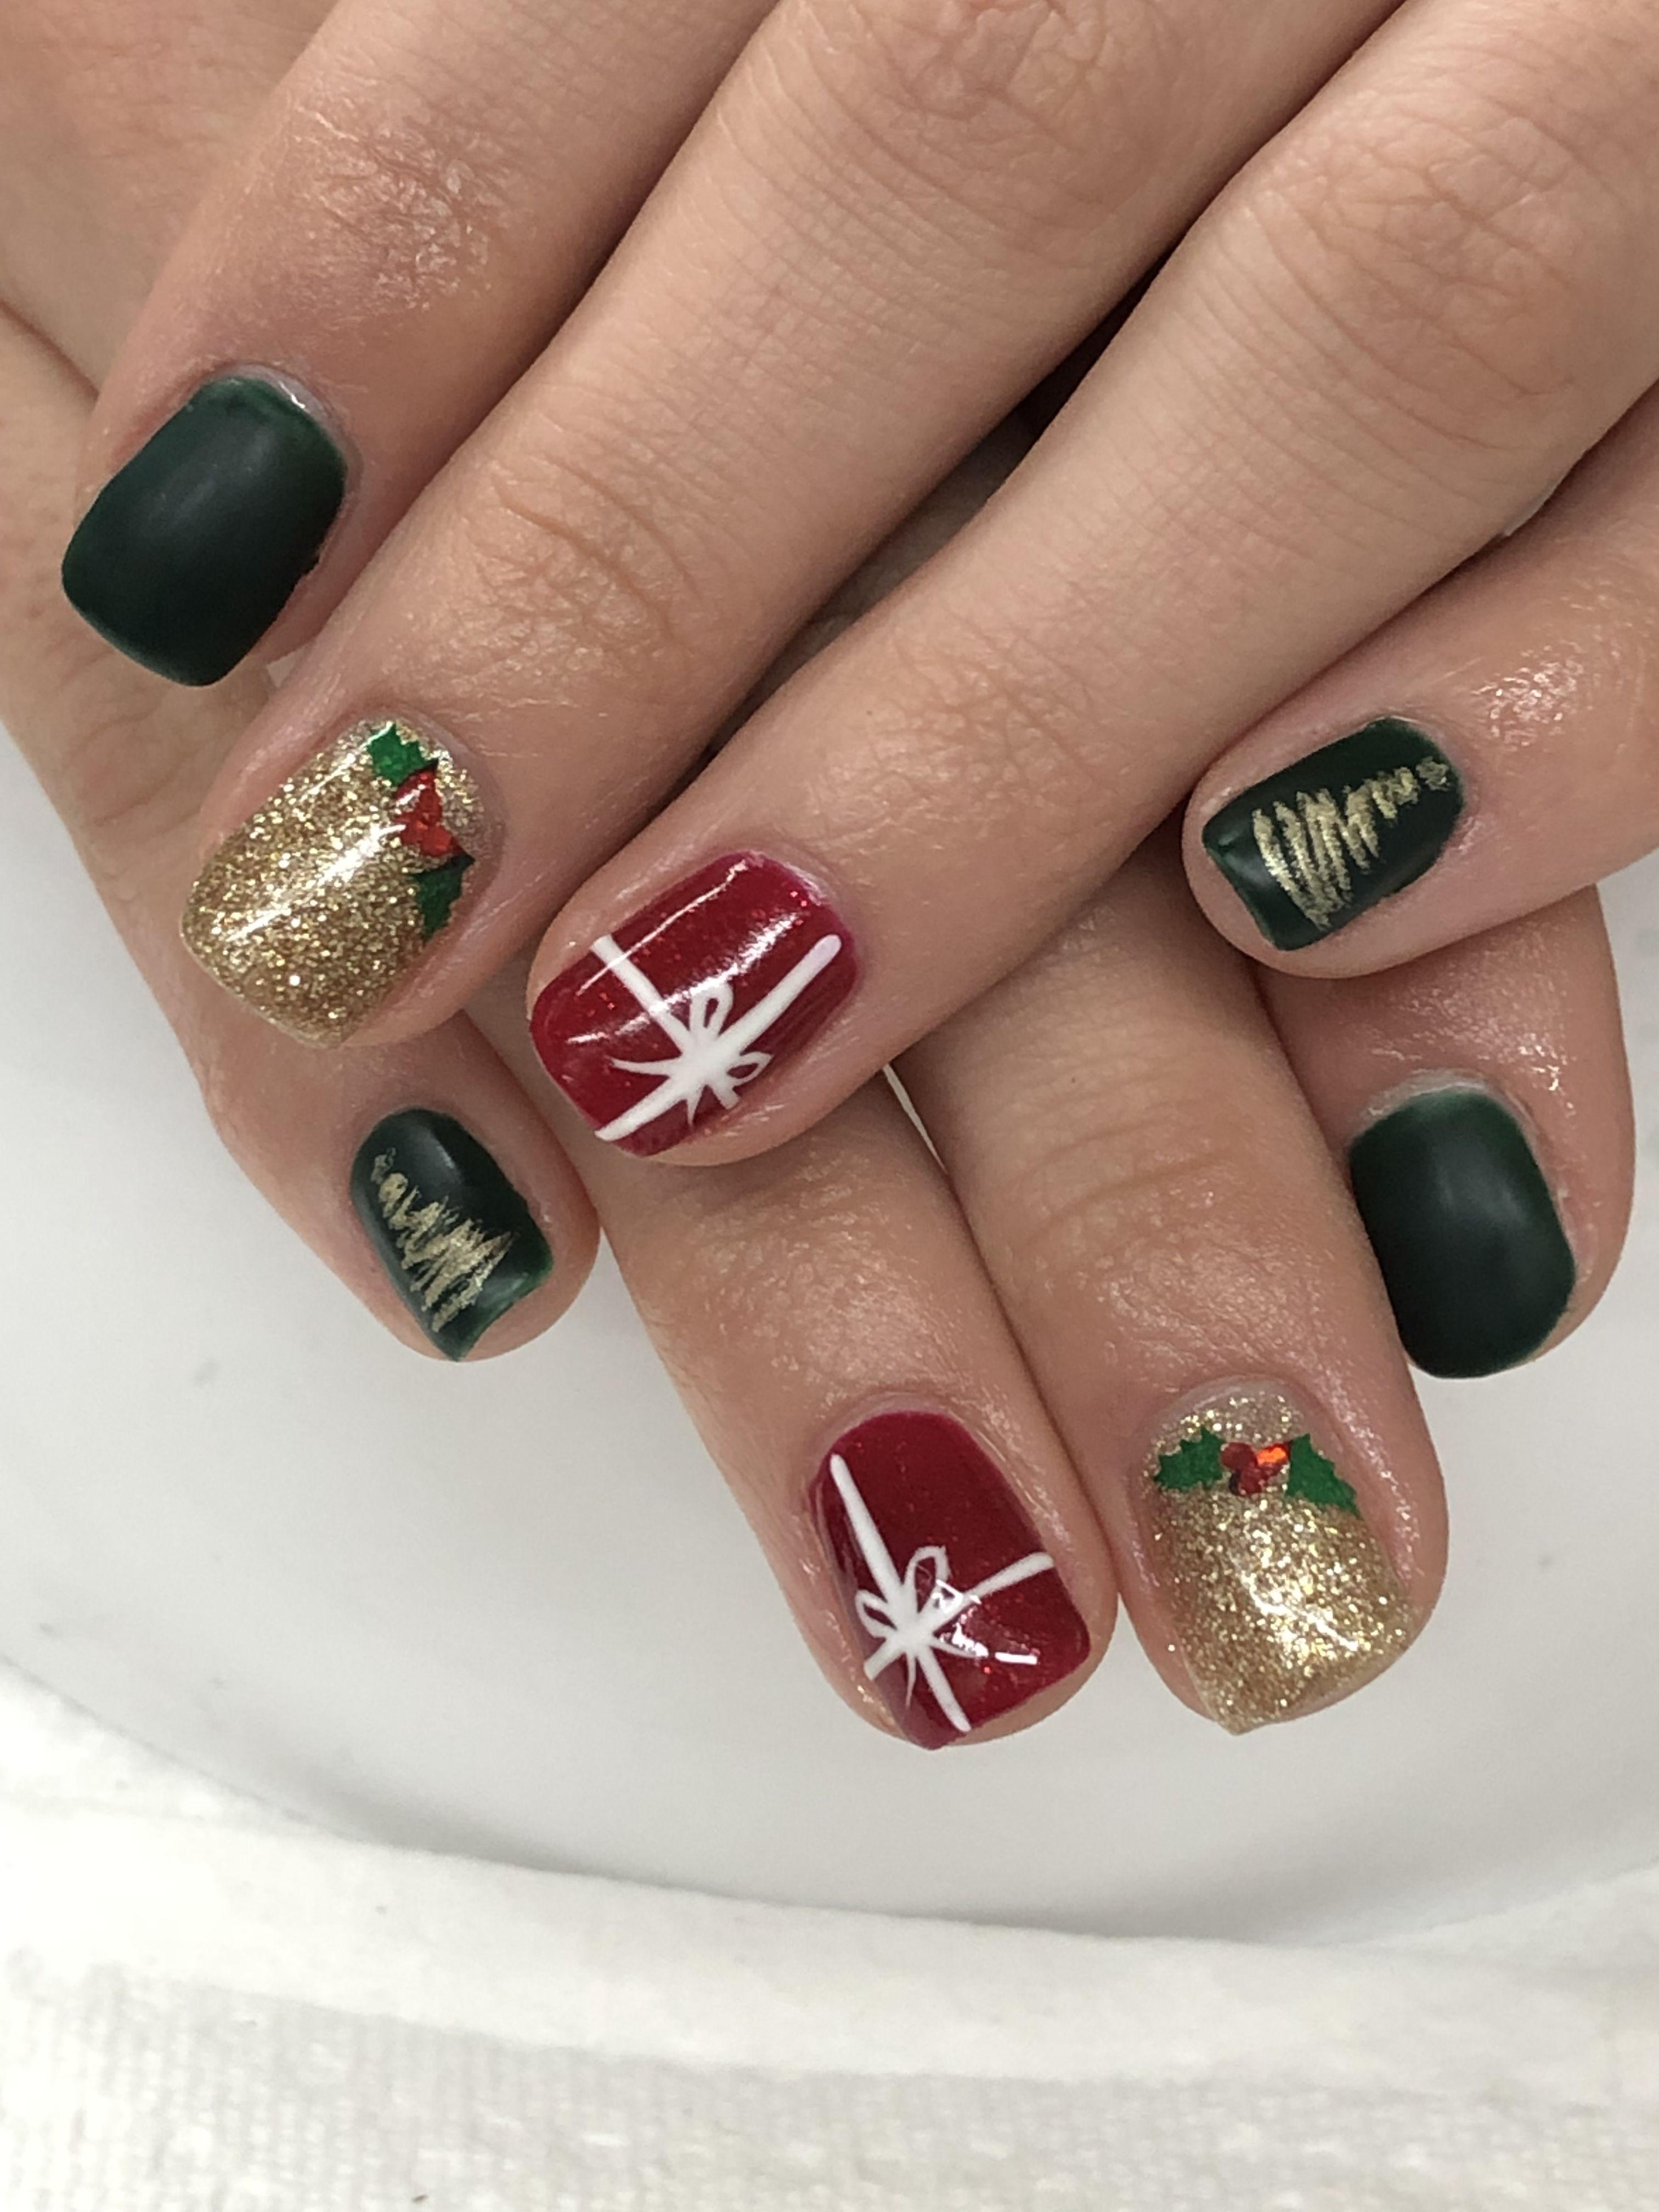 Red And Green Christmas Nails : green, christmas, nails, Christmas, Nails, Green, Holly, Present, Nails,